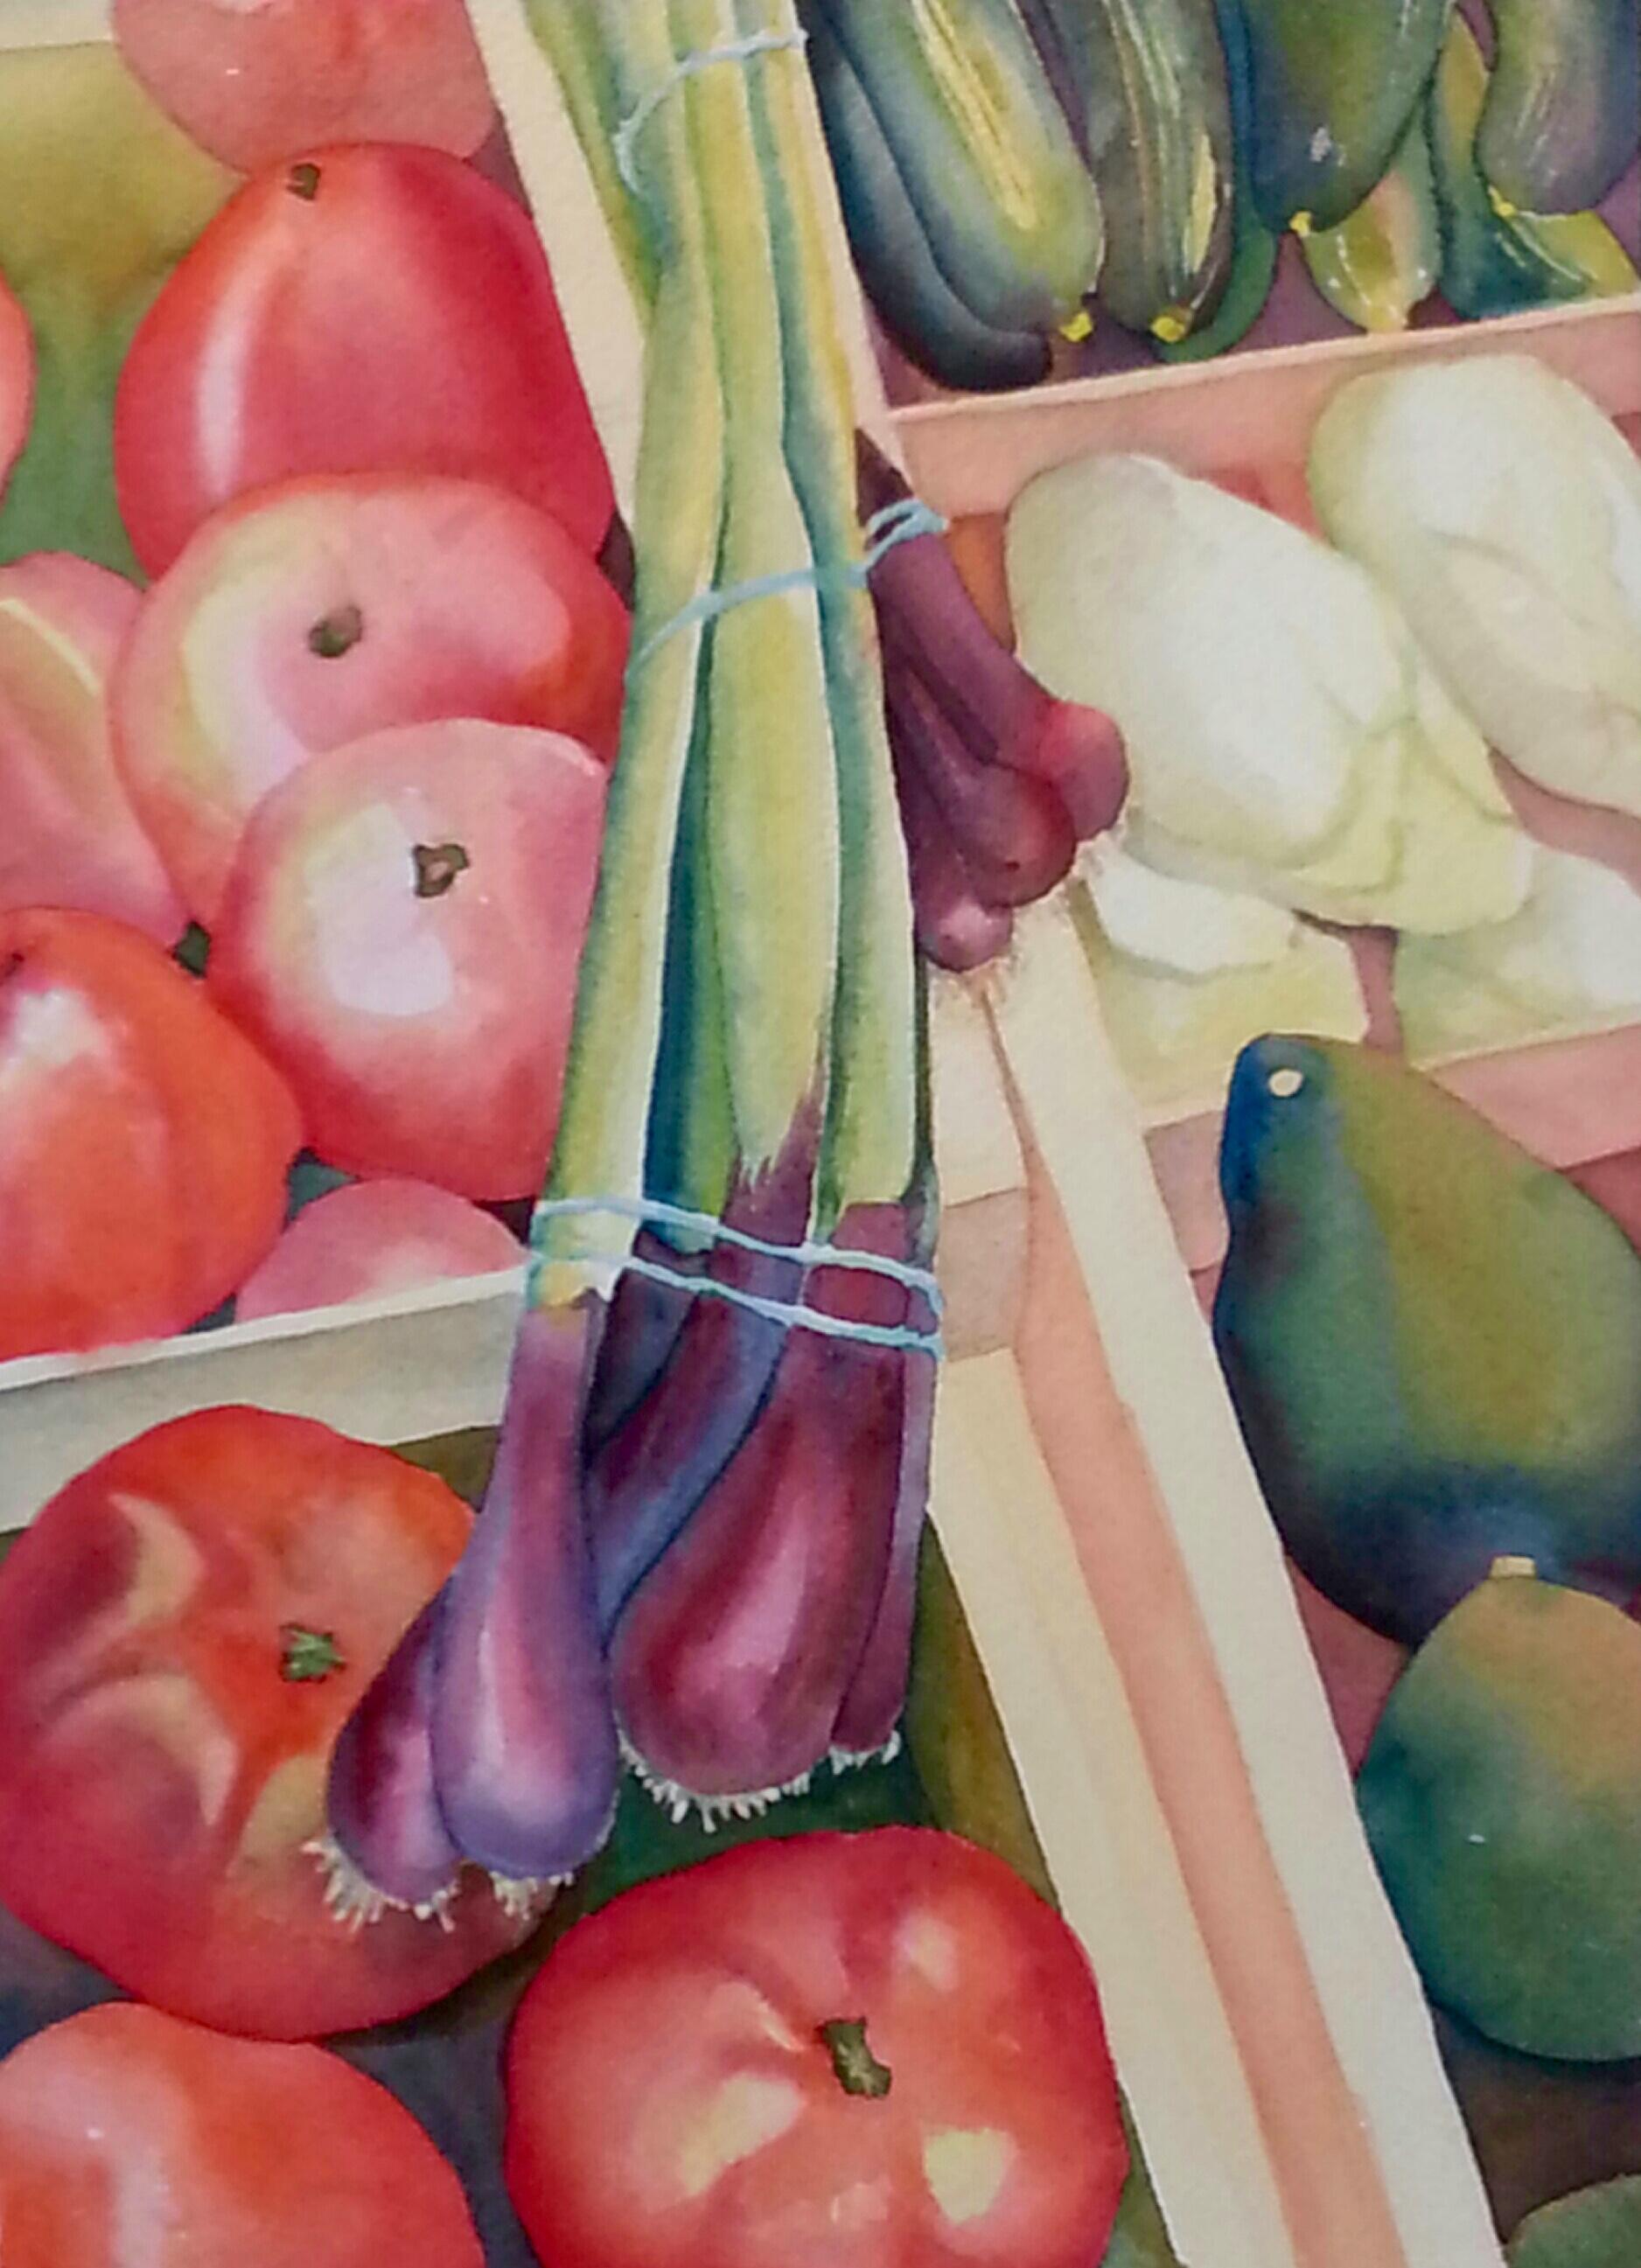 "The Vegetable Vendor, watercolor, 20"" x 16"", (unavailable)"